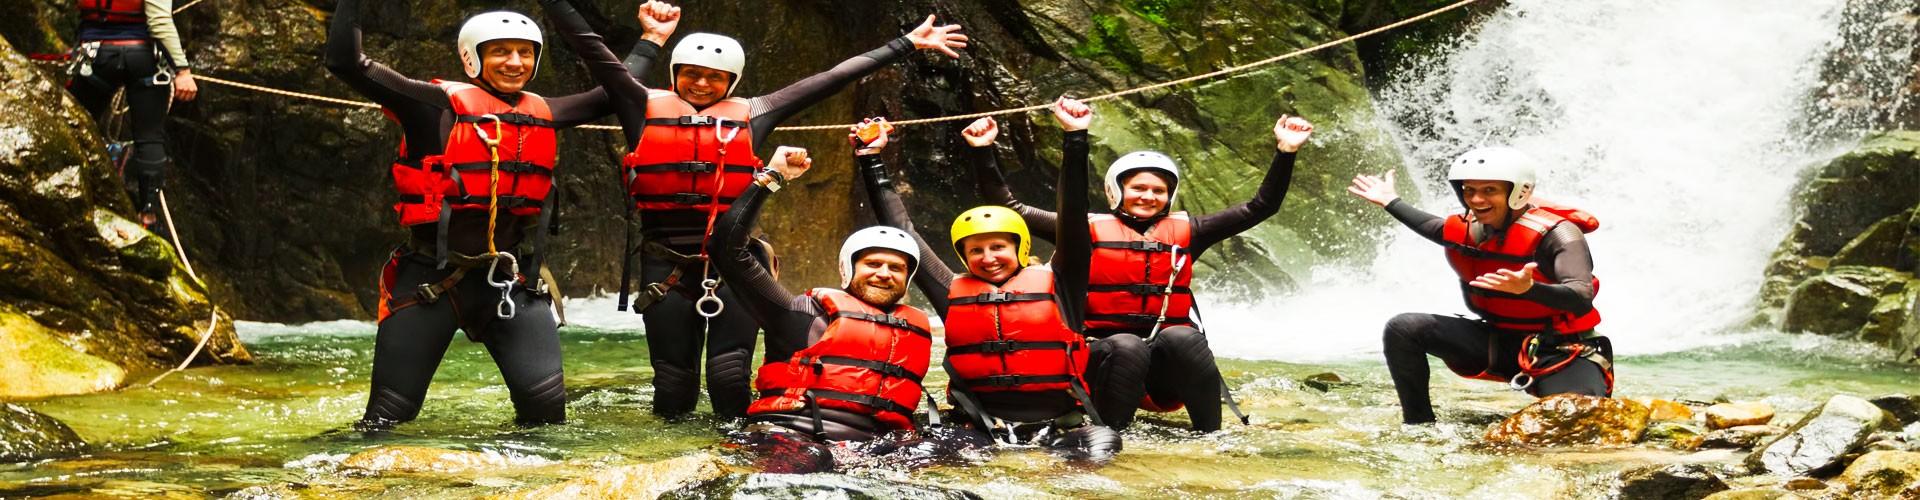 Wasser Zentren Wassersport Berchtesgaden